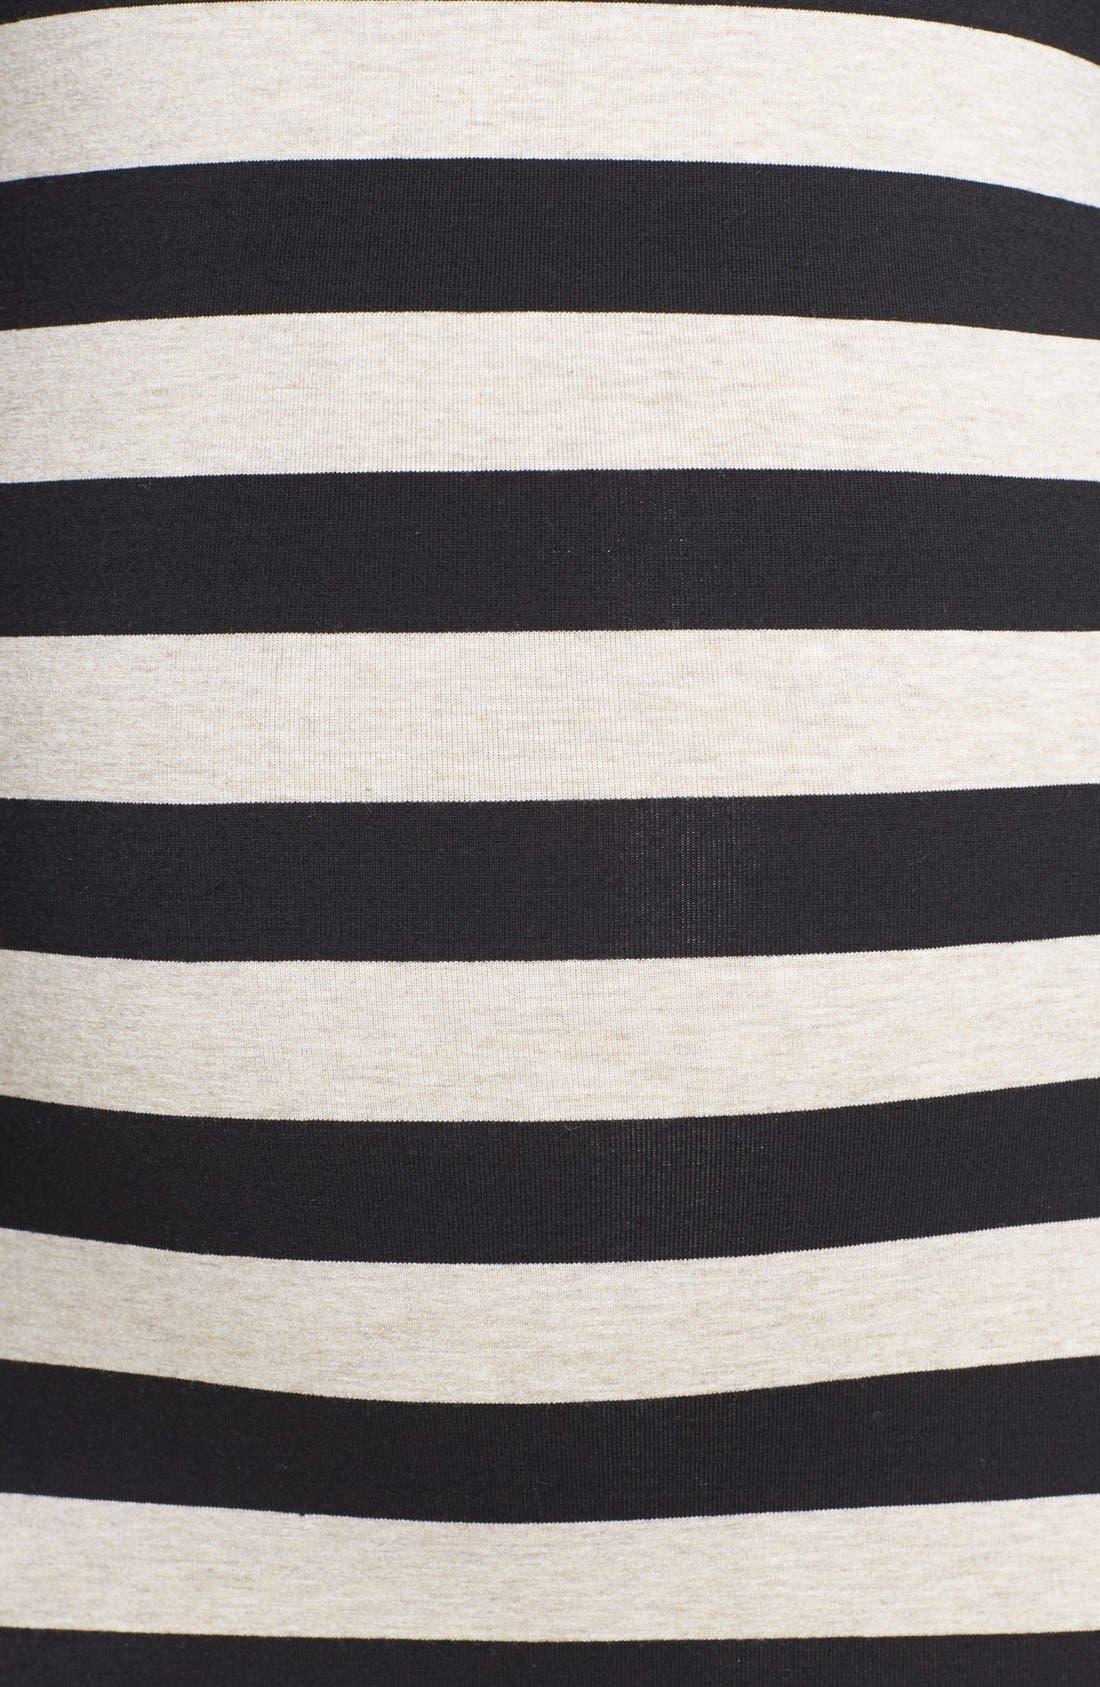 Alternate Image 3  - Nom Maternity 'Krystal' Stripe Maternity Dress